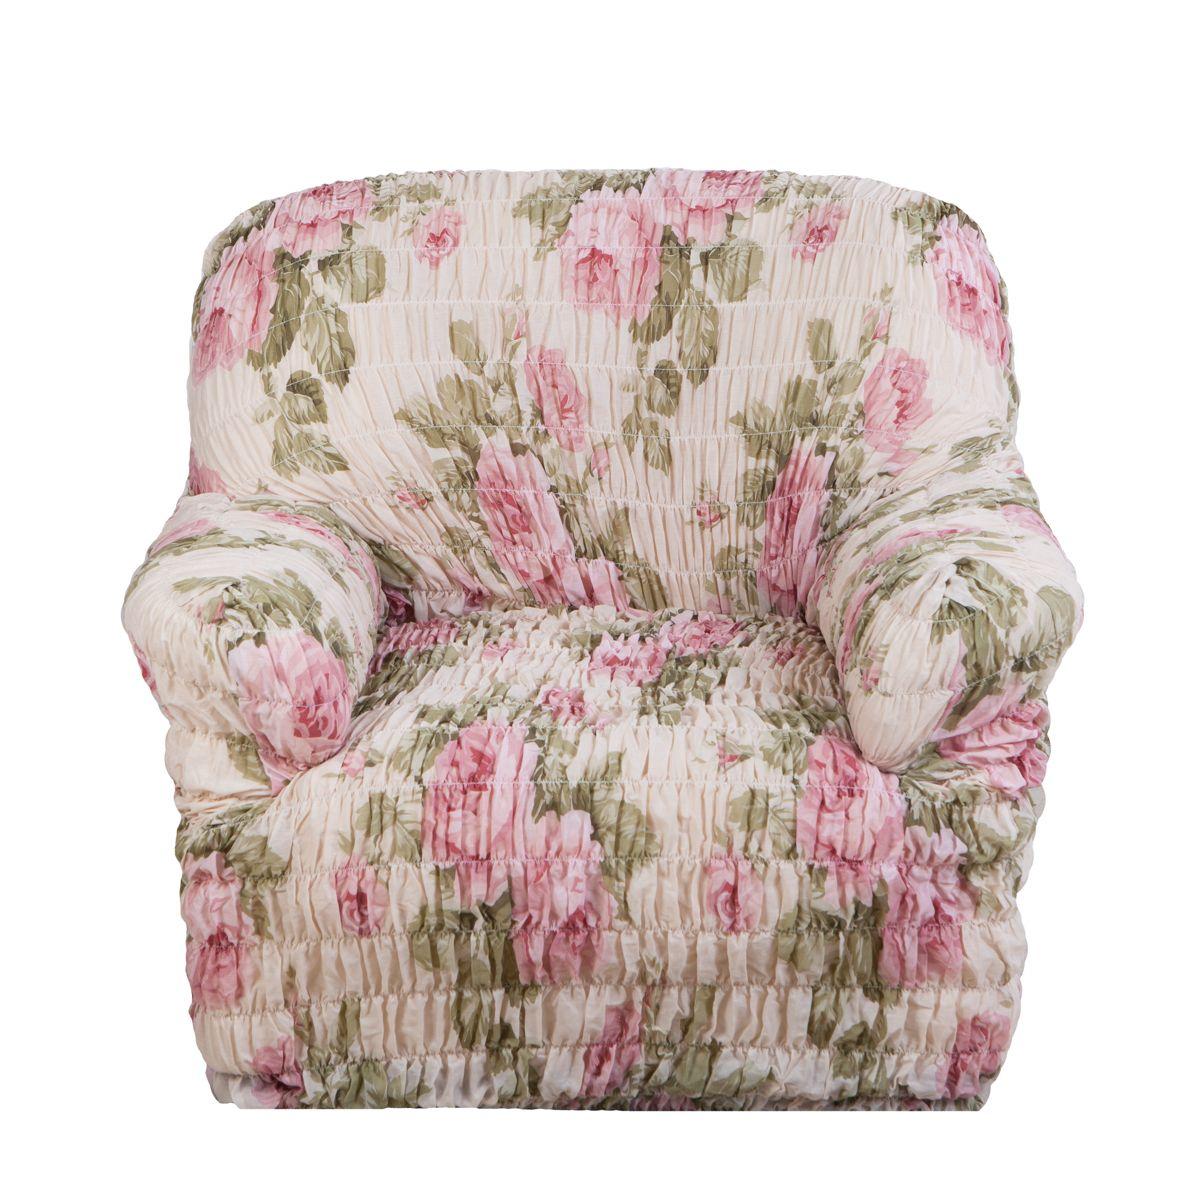 Фантазия Чайная Роза. Чехол на кресло, без юбкиФантазия<br><br>